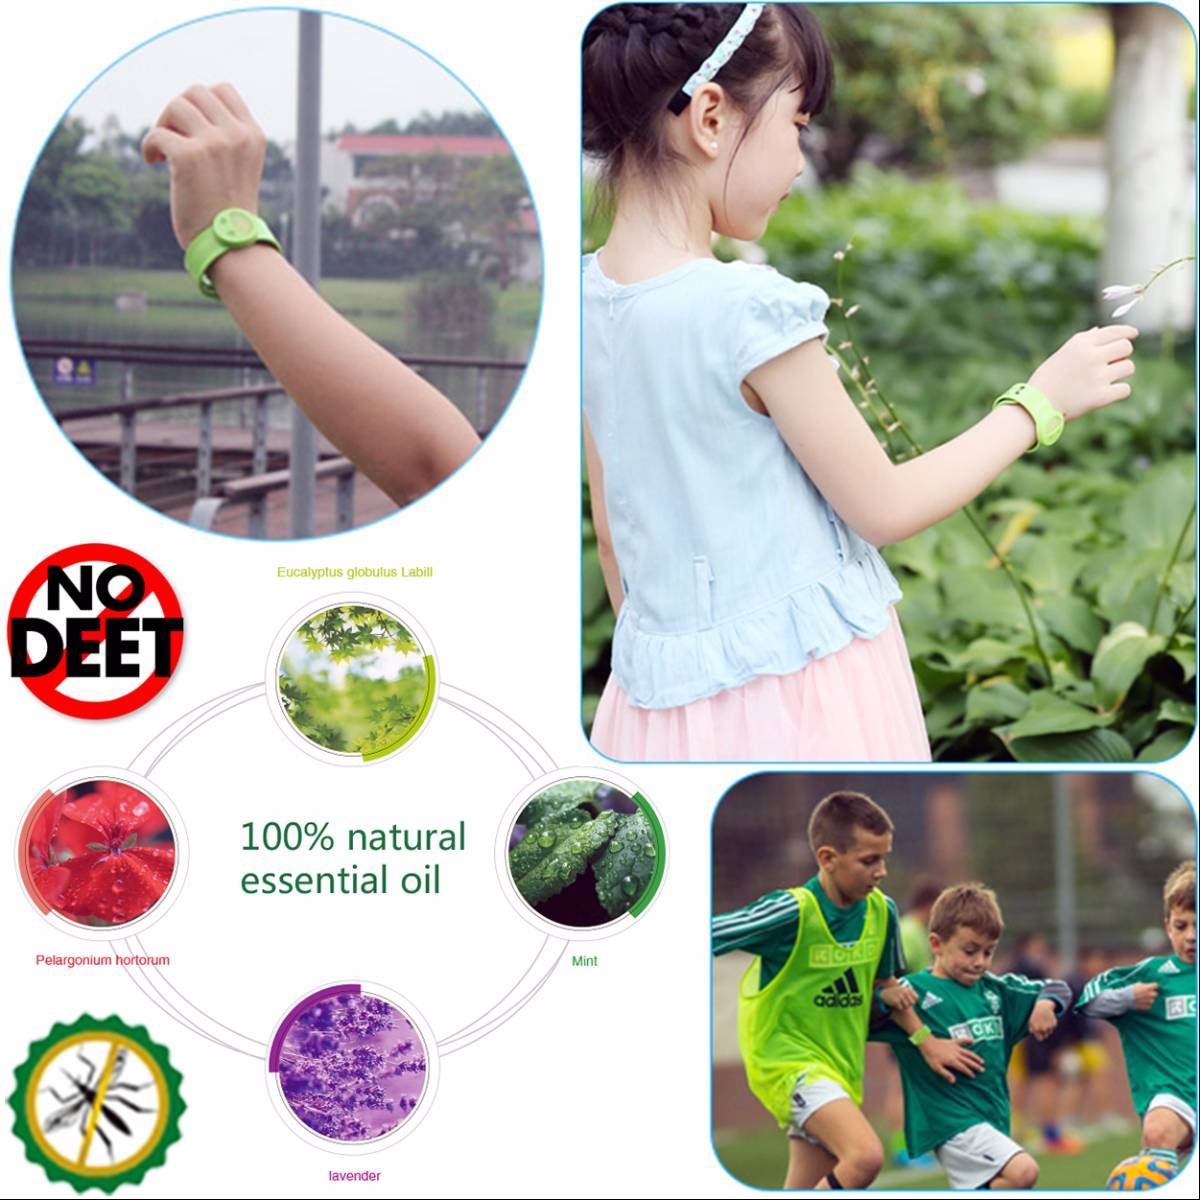 Babygo Refill Smiley Mosquito Repellent (isi Ulang Anti Nyamuk)4